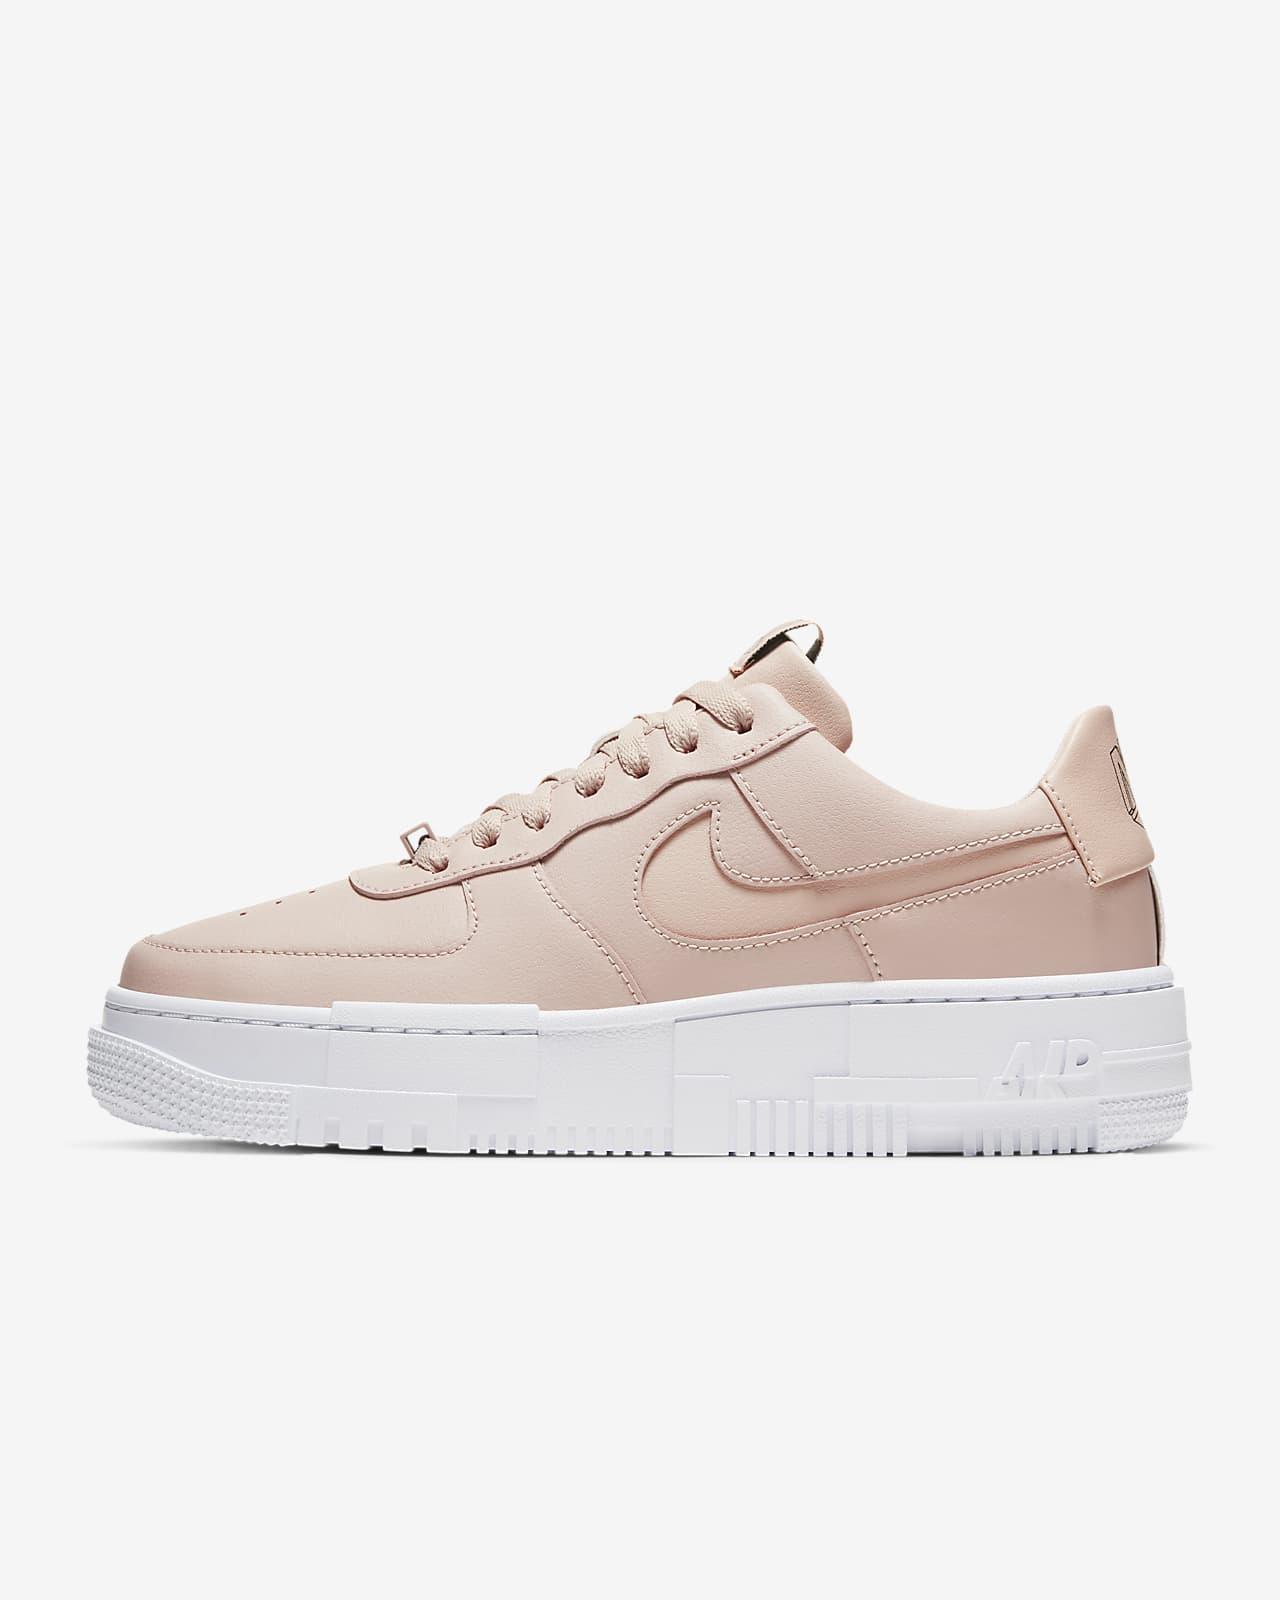 nike air force 1 zapatillas mujer